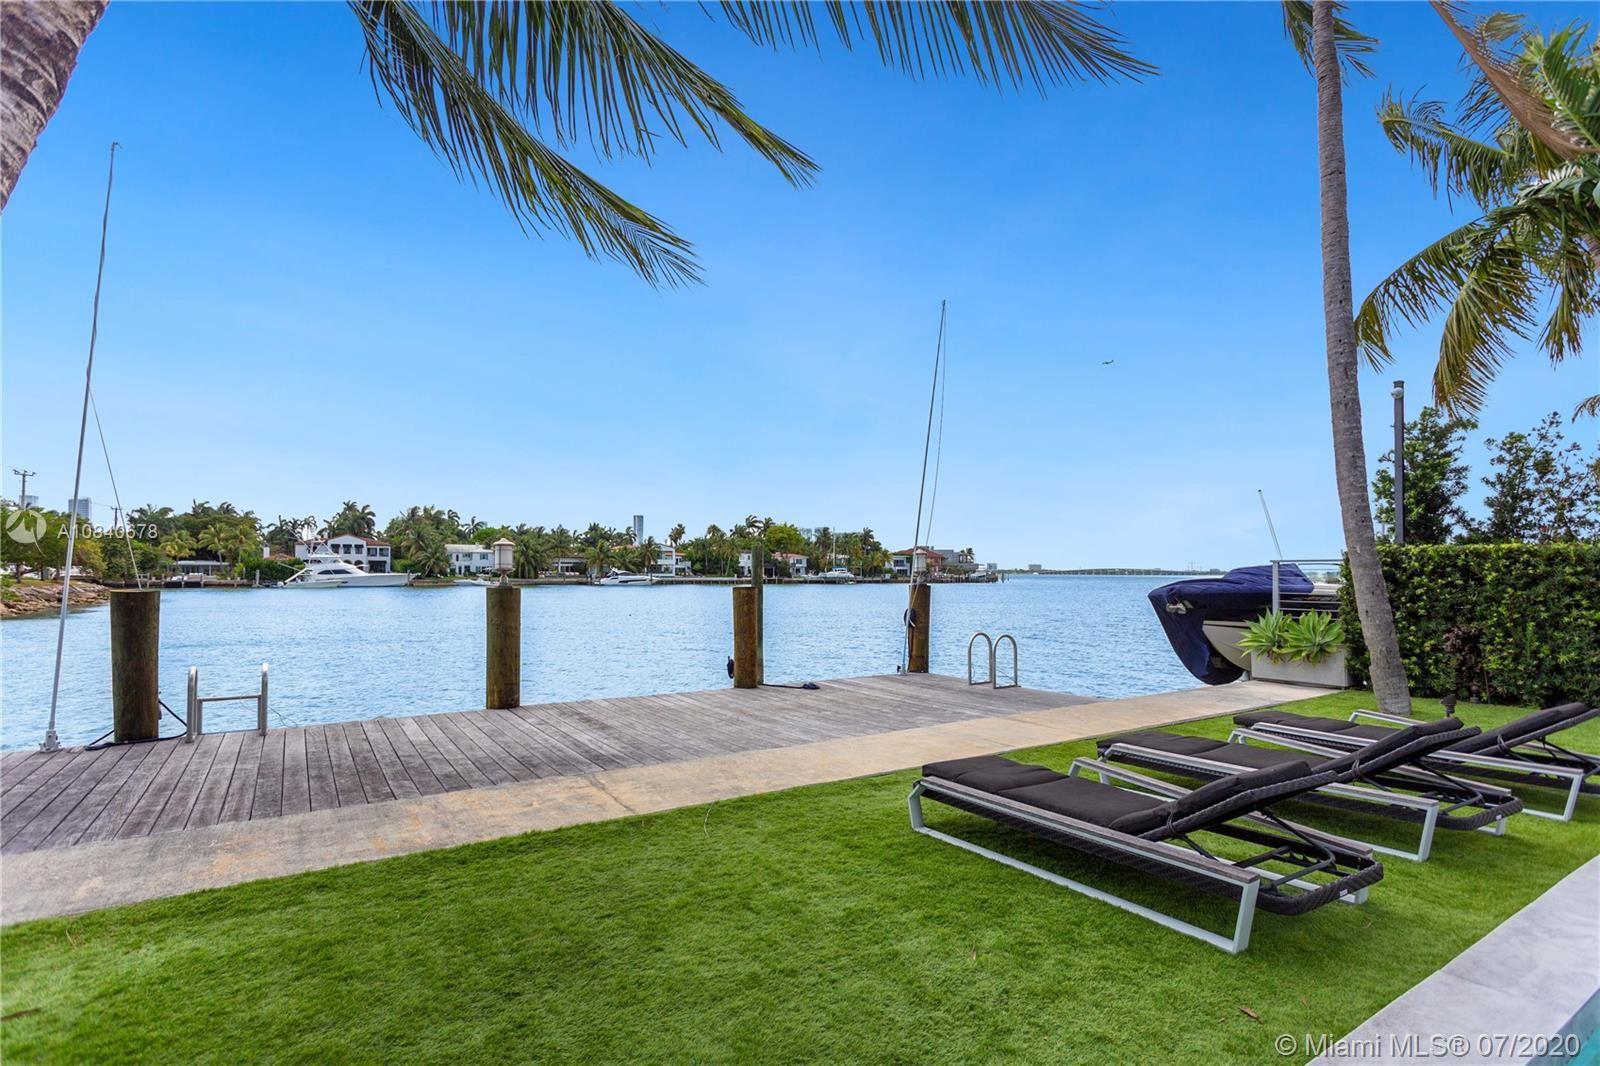 Photo 9 of Listing MLS a10840678 in 440 W Dilido Dr Miami Beach FL 33139